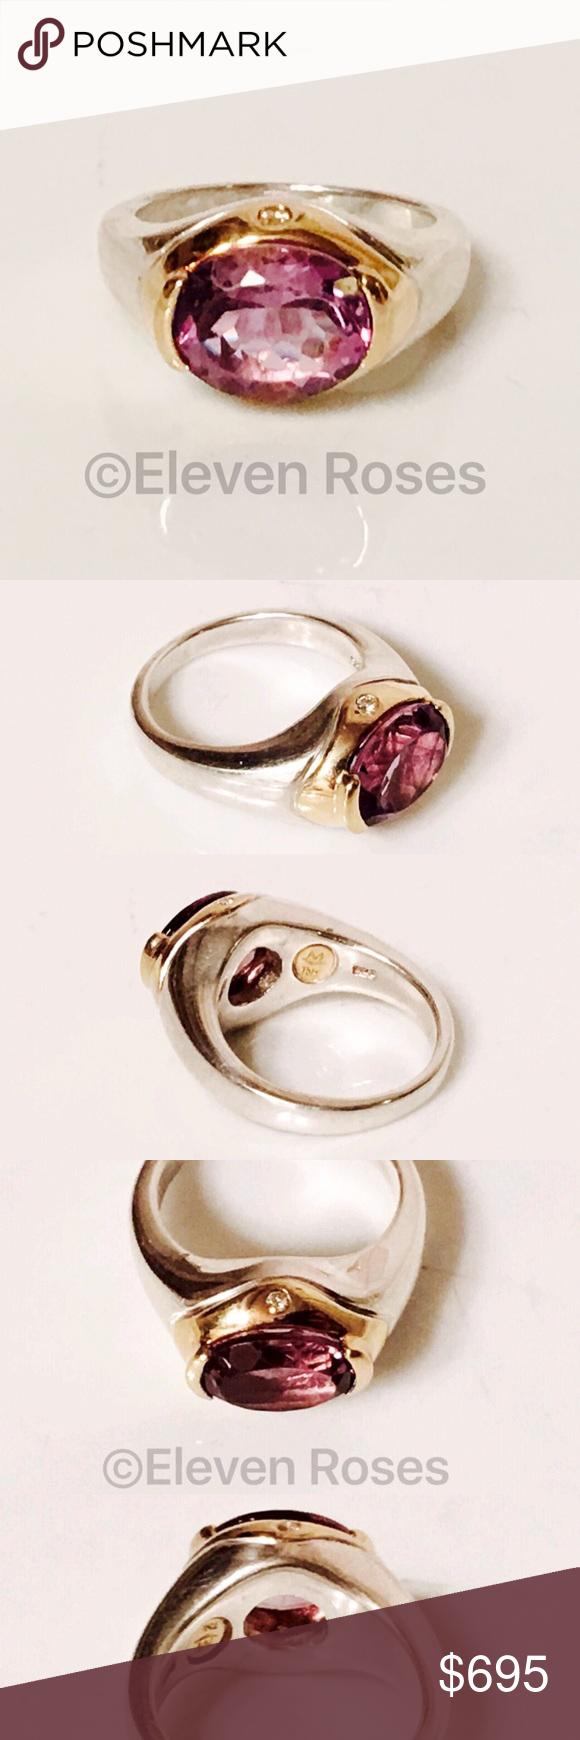 Movado Sterling 18k Gold Amethyst Diamond Ring Movado Amethyst